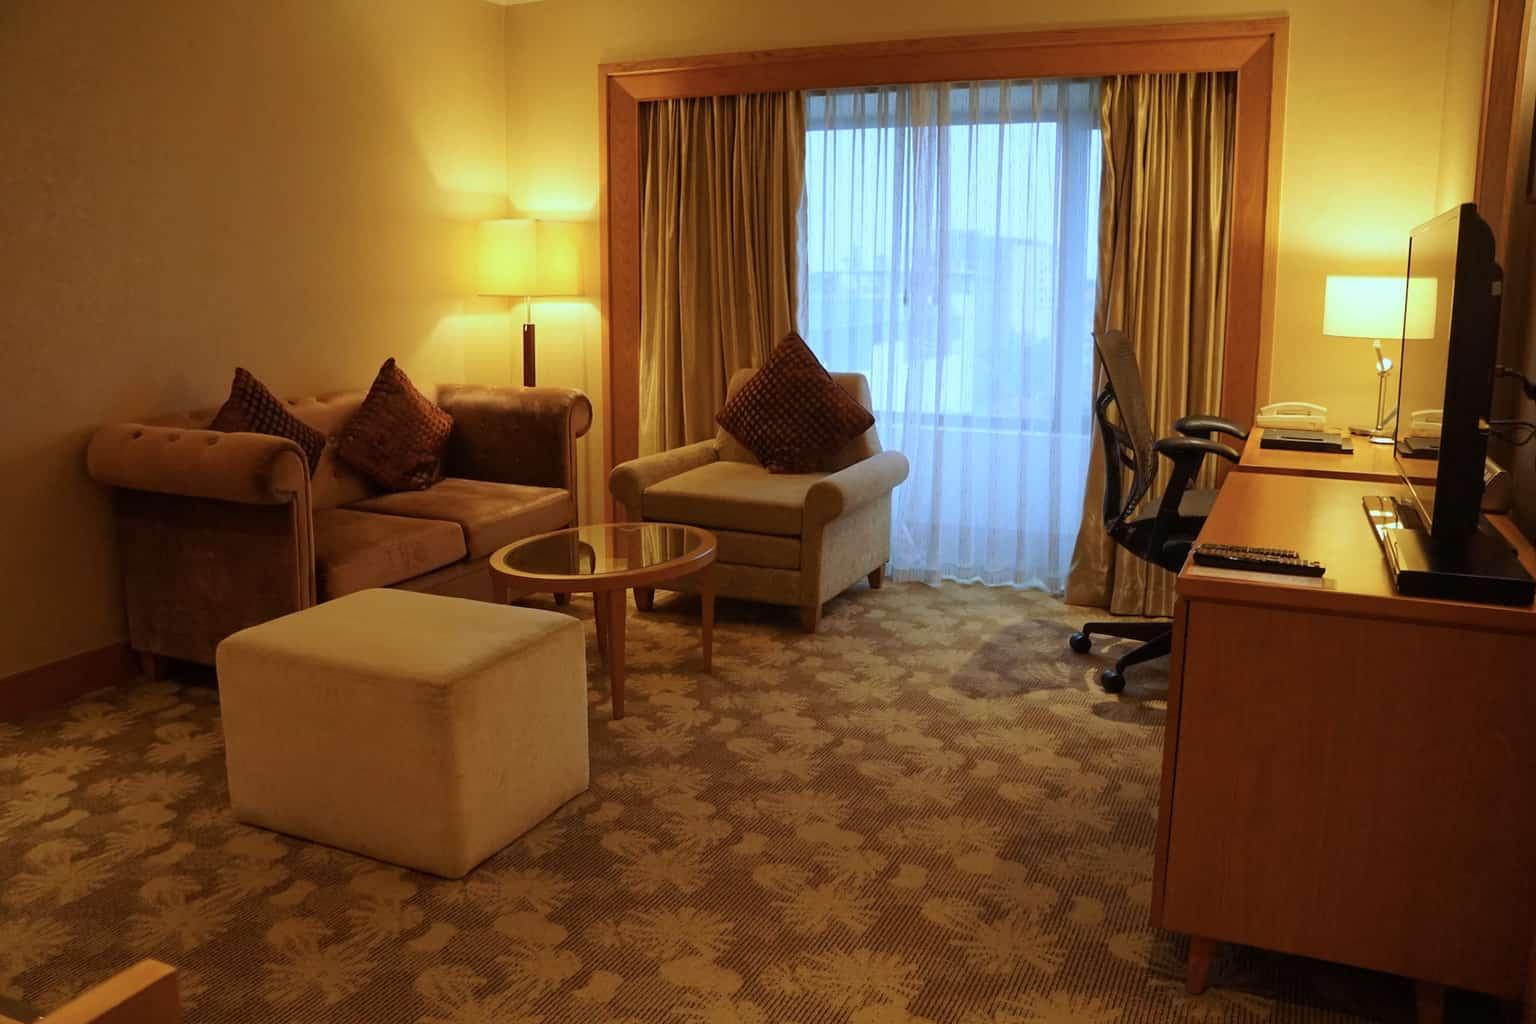 hotel suite living room